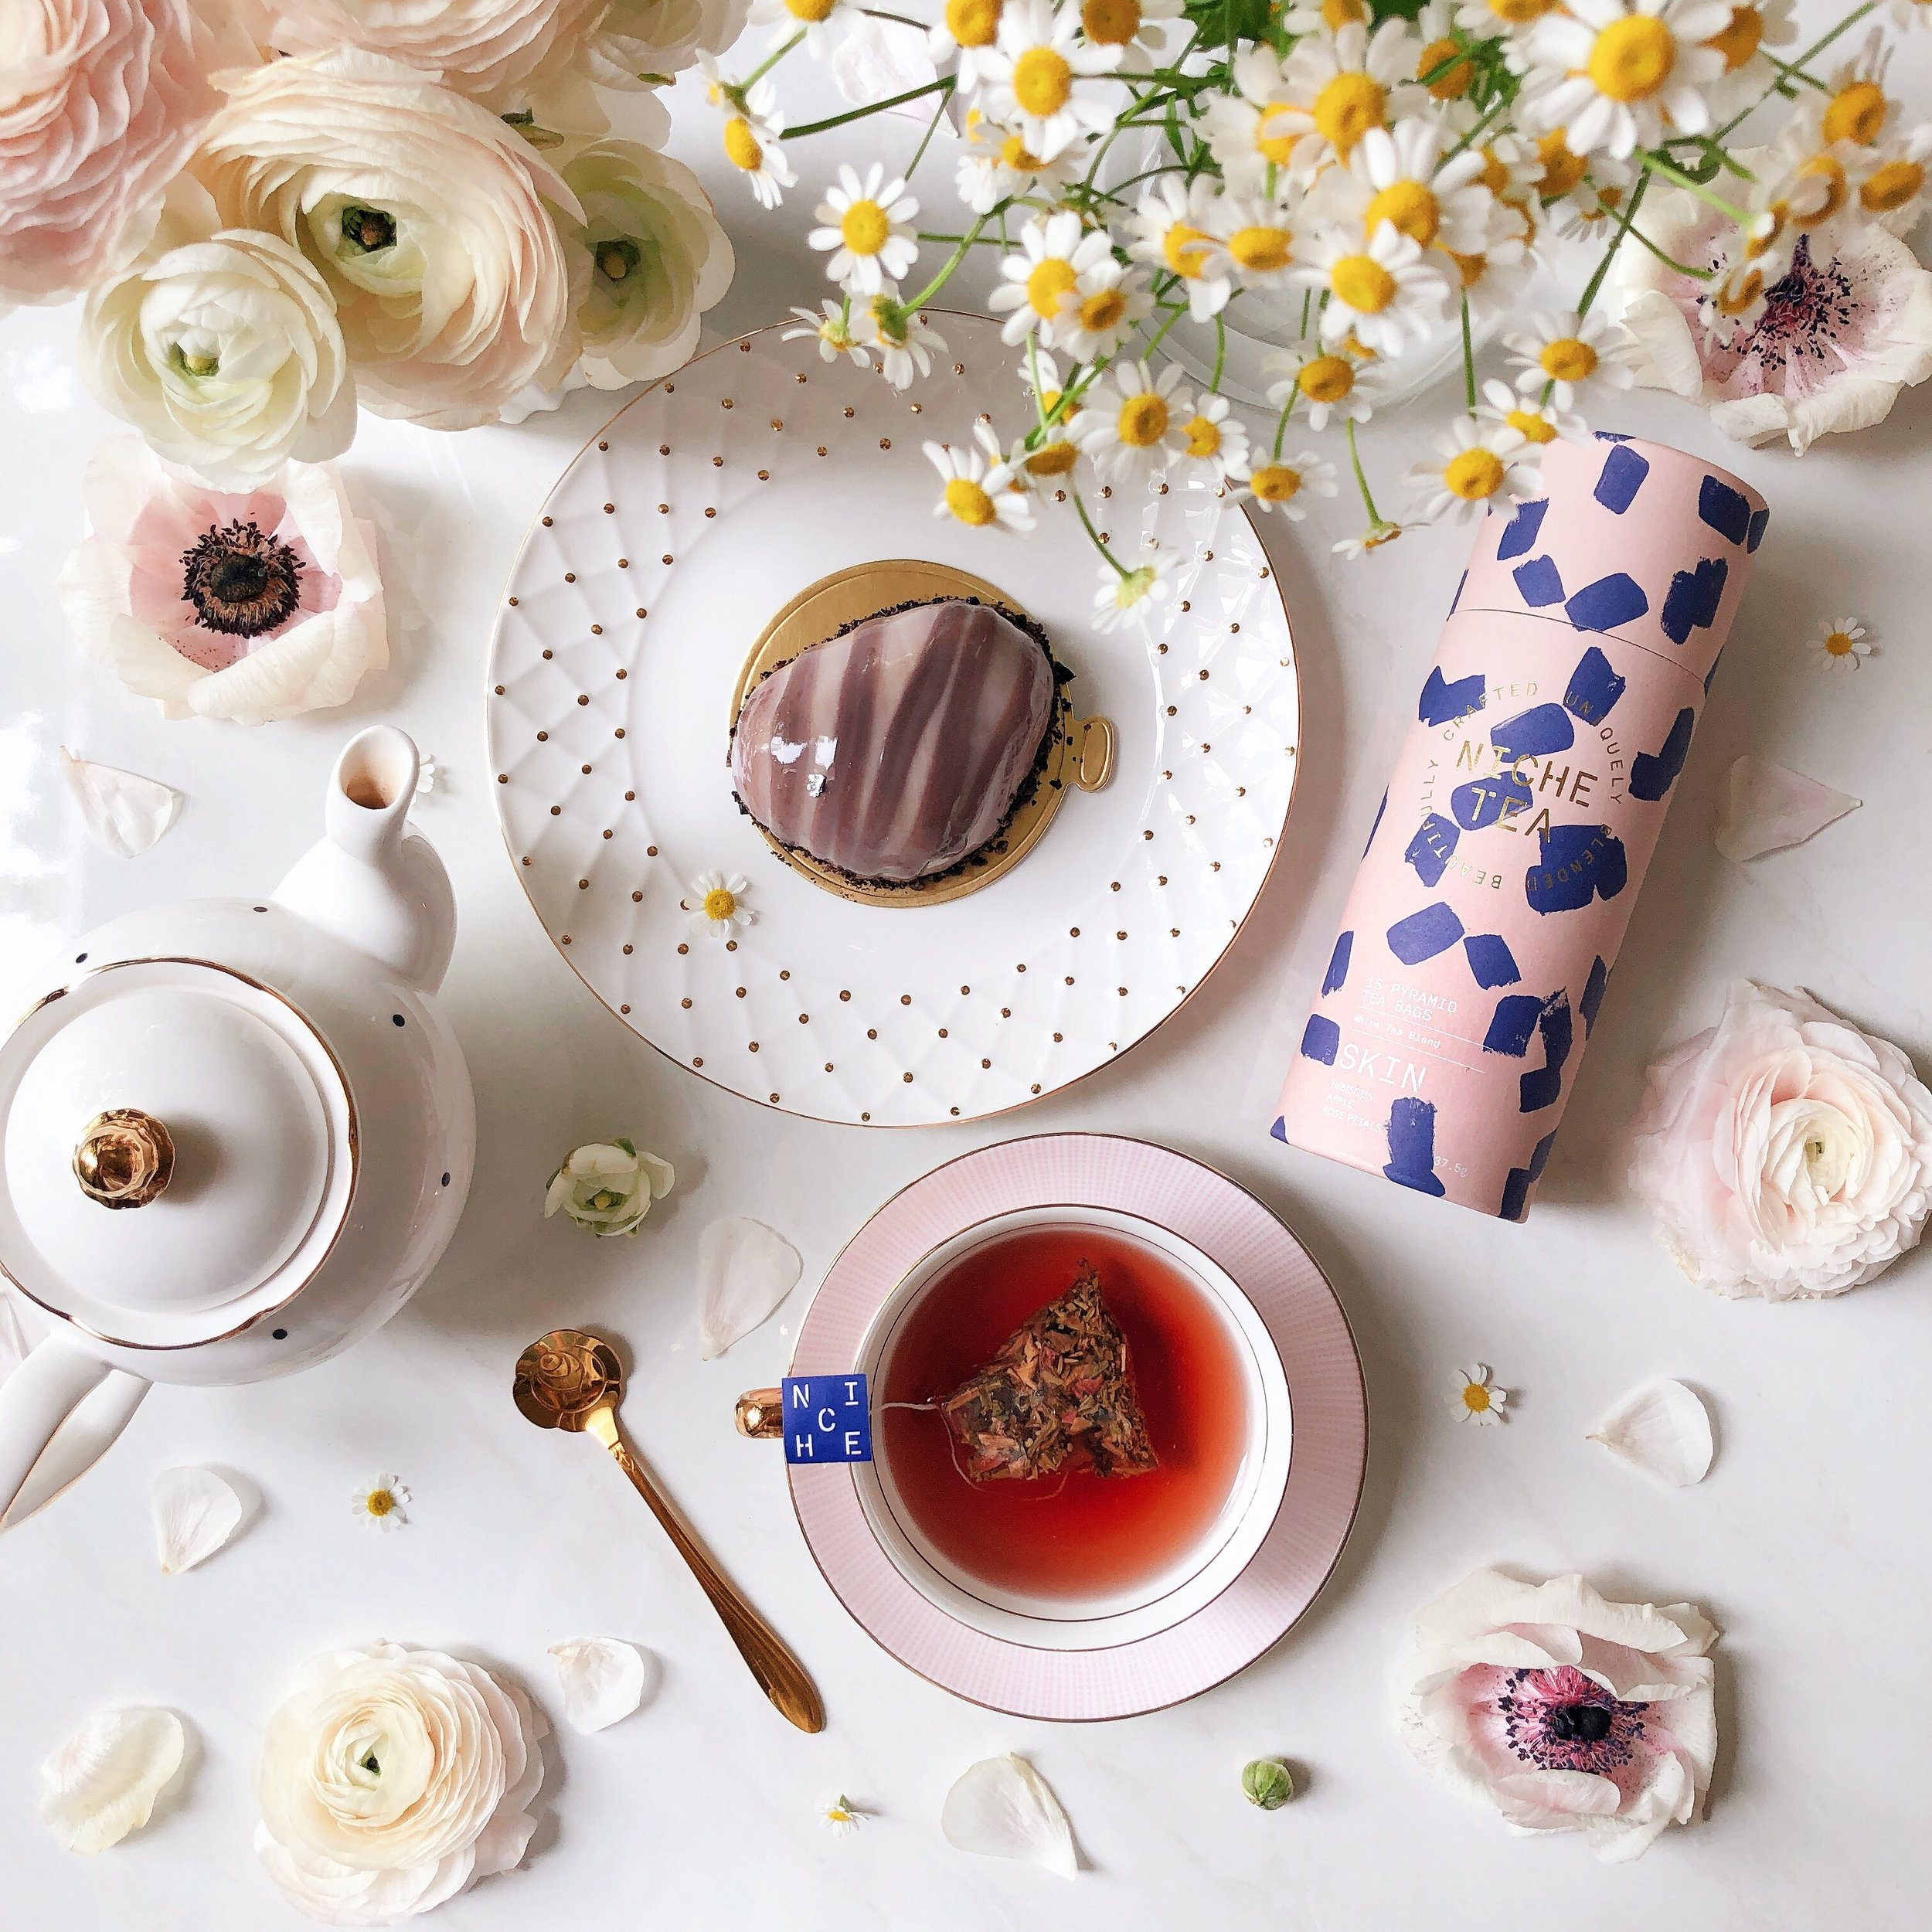 NICHE TEA ANNOUNCEMENT IMAGE.JPG